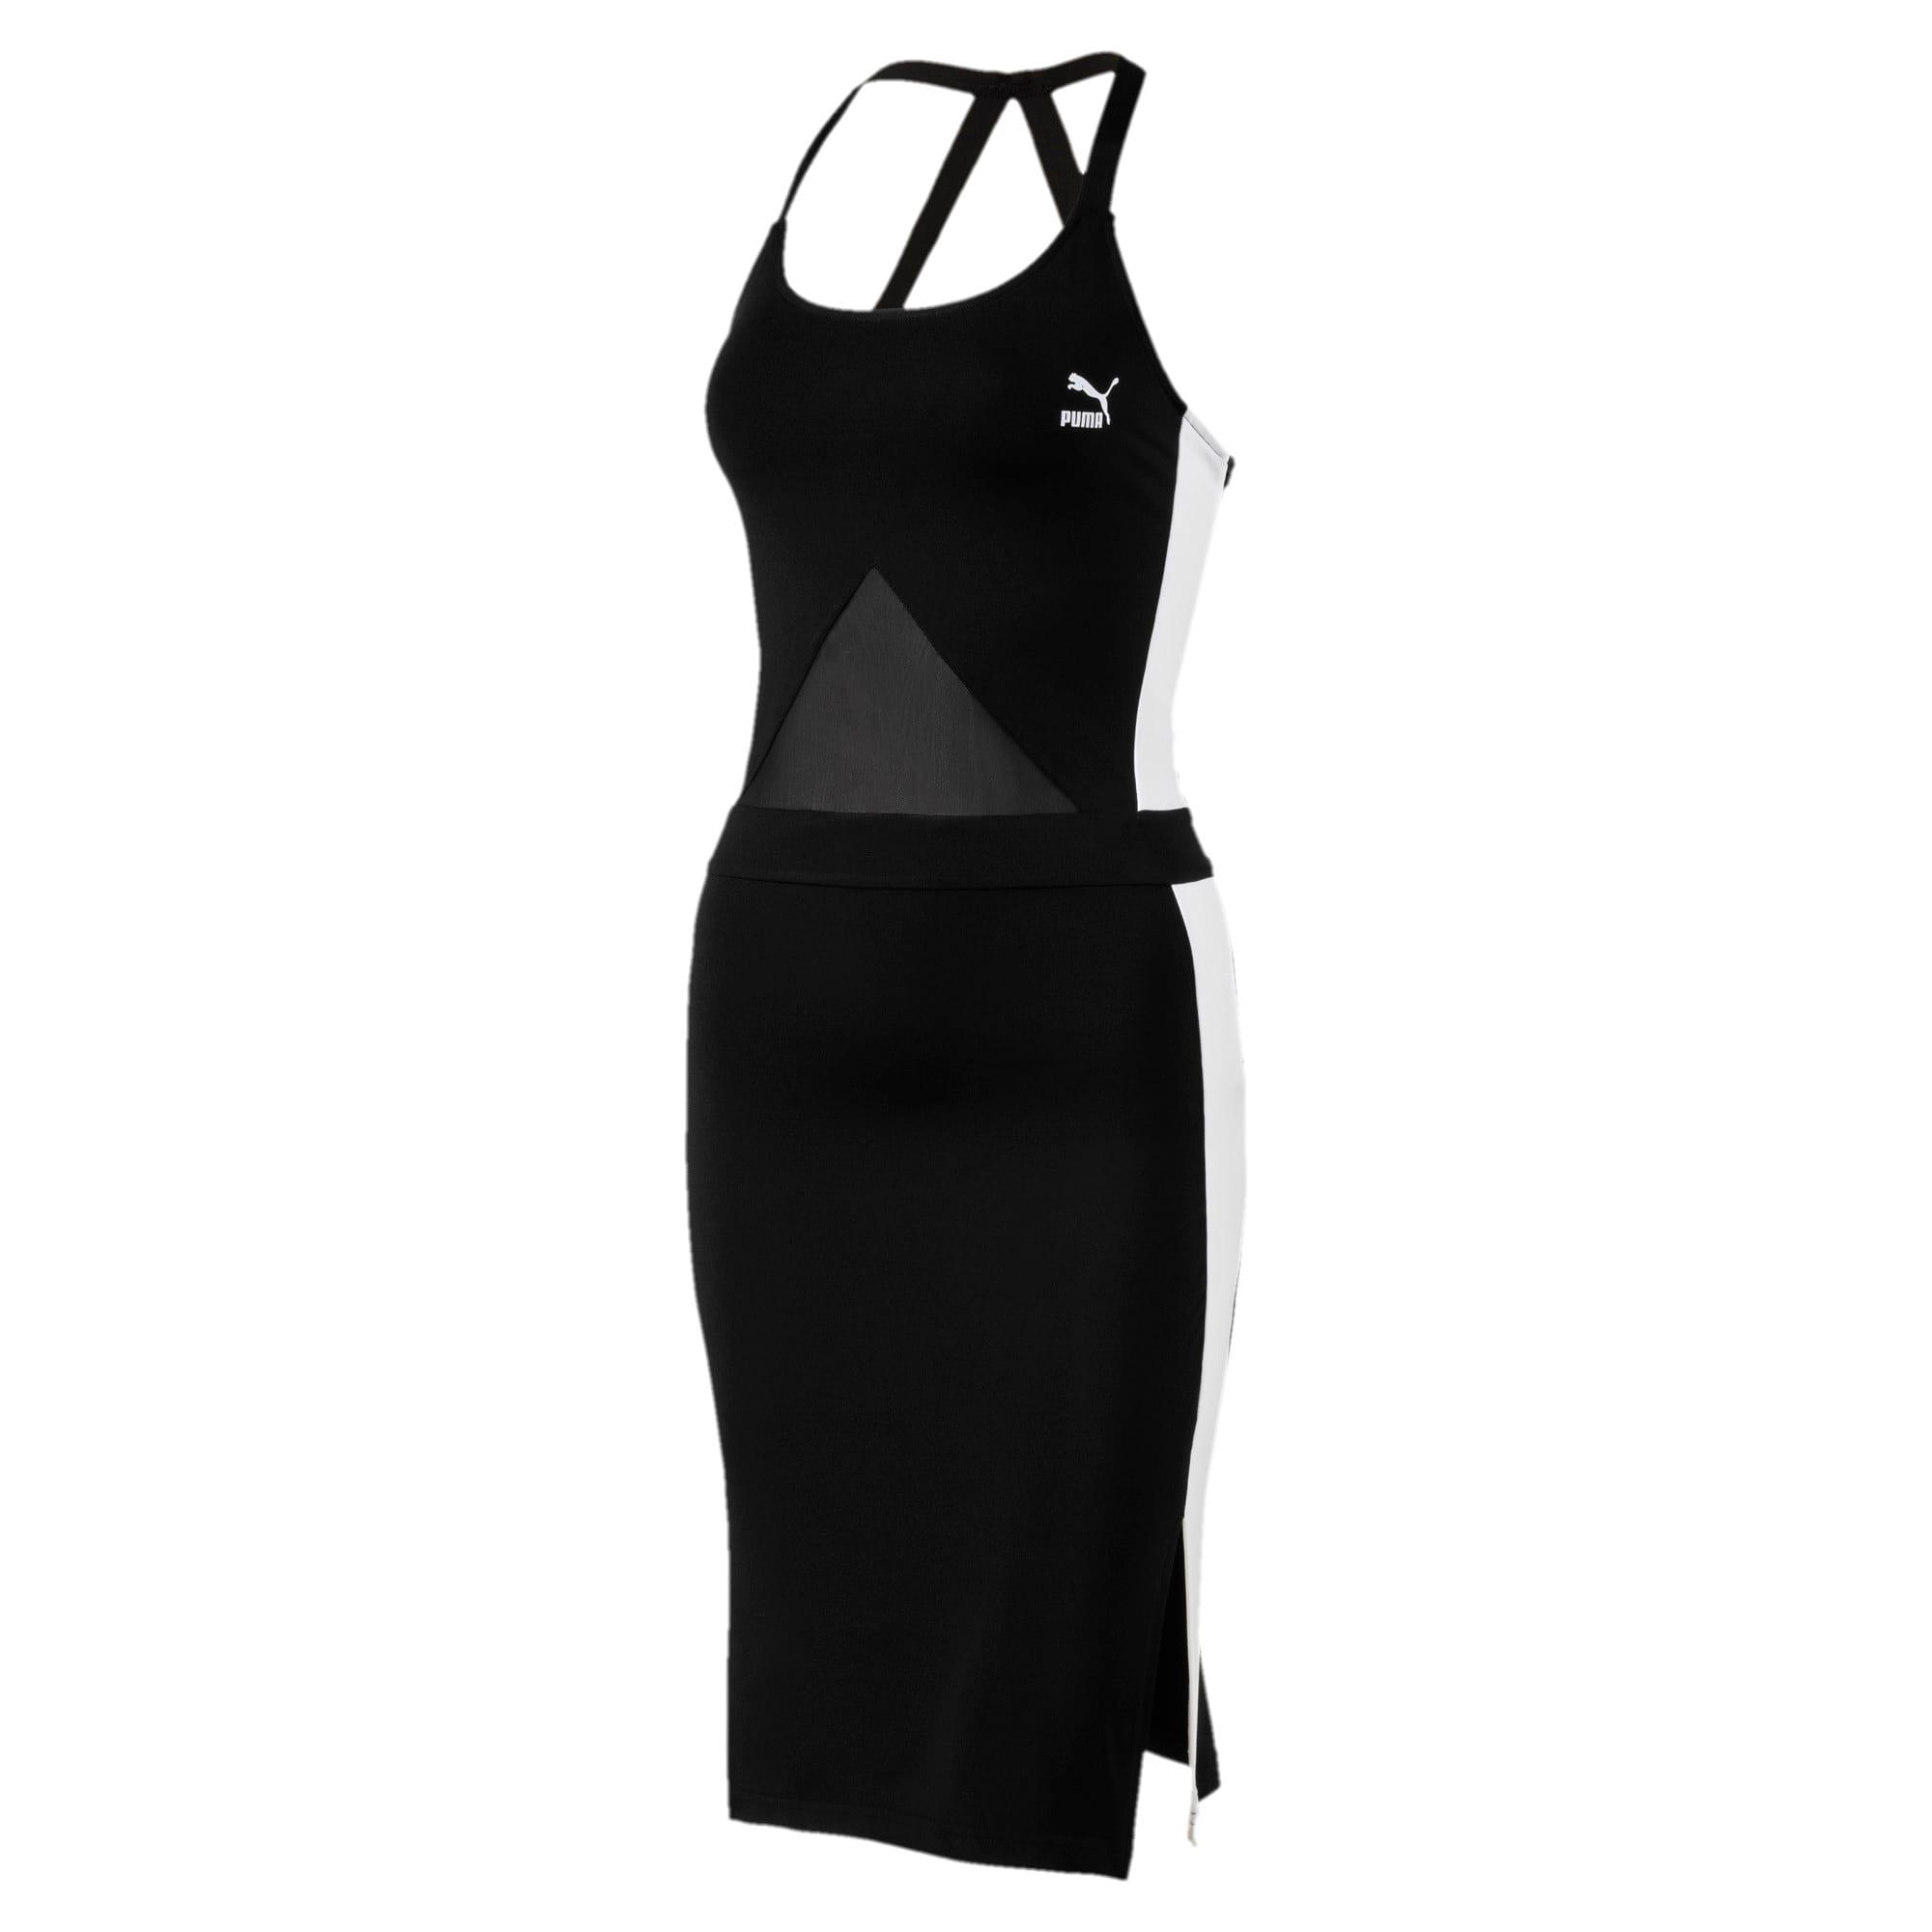 Thumbnail 1 of Archive T7 Women's Dress, Puma Black, medium-IND